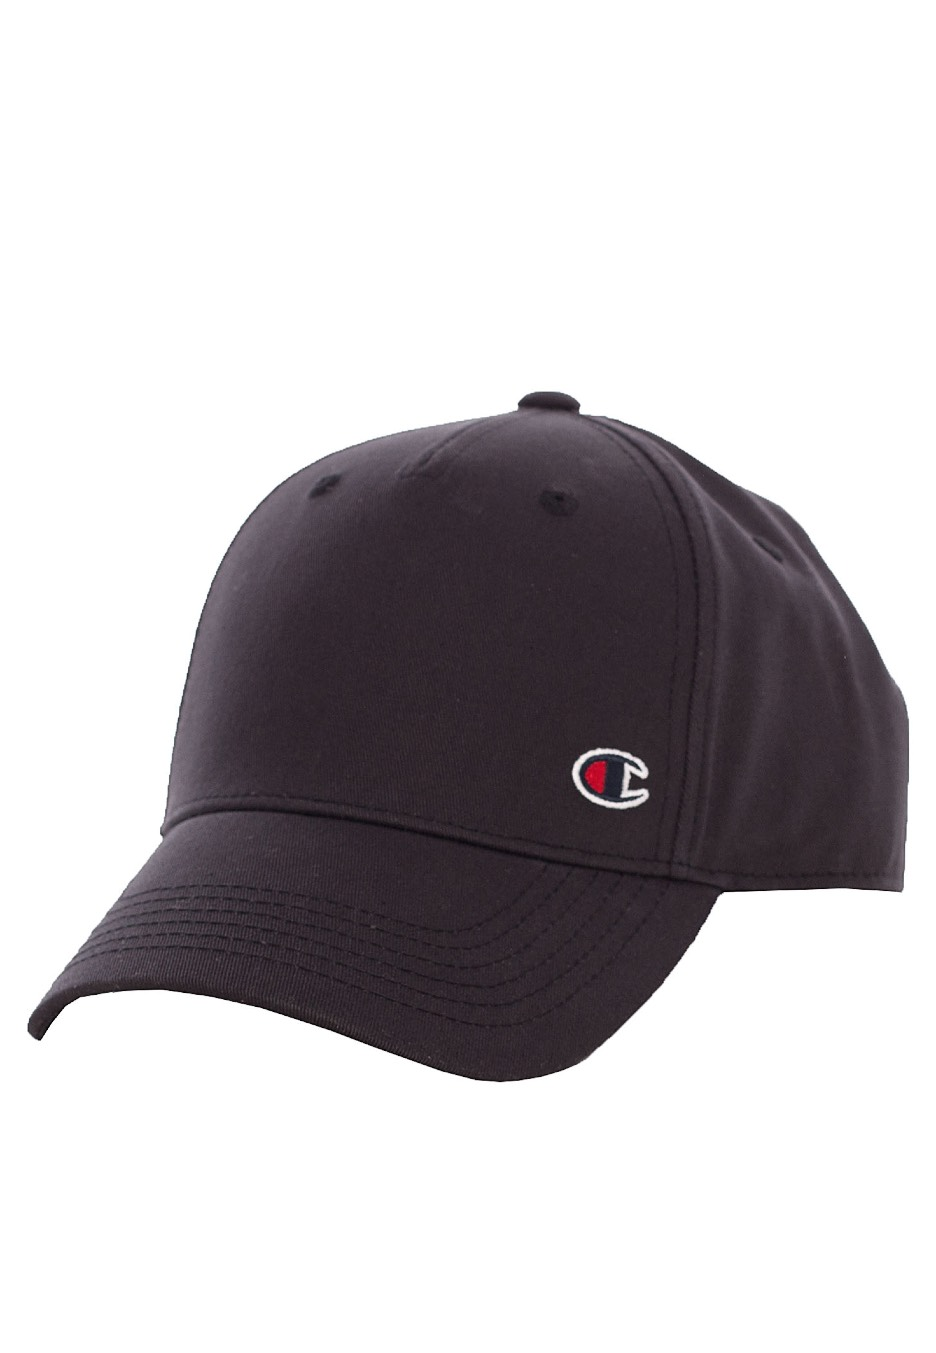 Champion - Baseball Charcoal - Cap - Streetwear Shop - Impericon.com US c835b4f560b